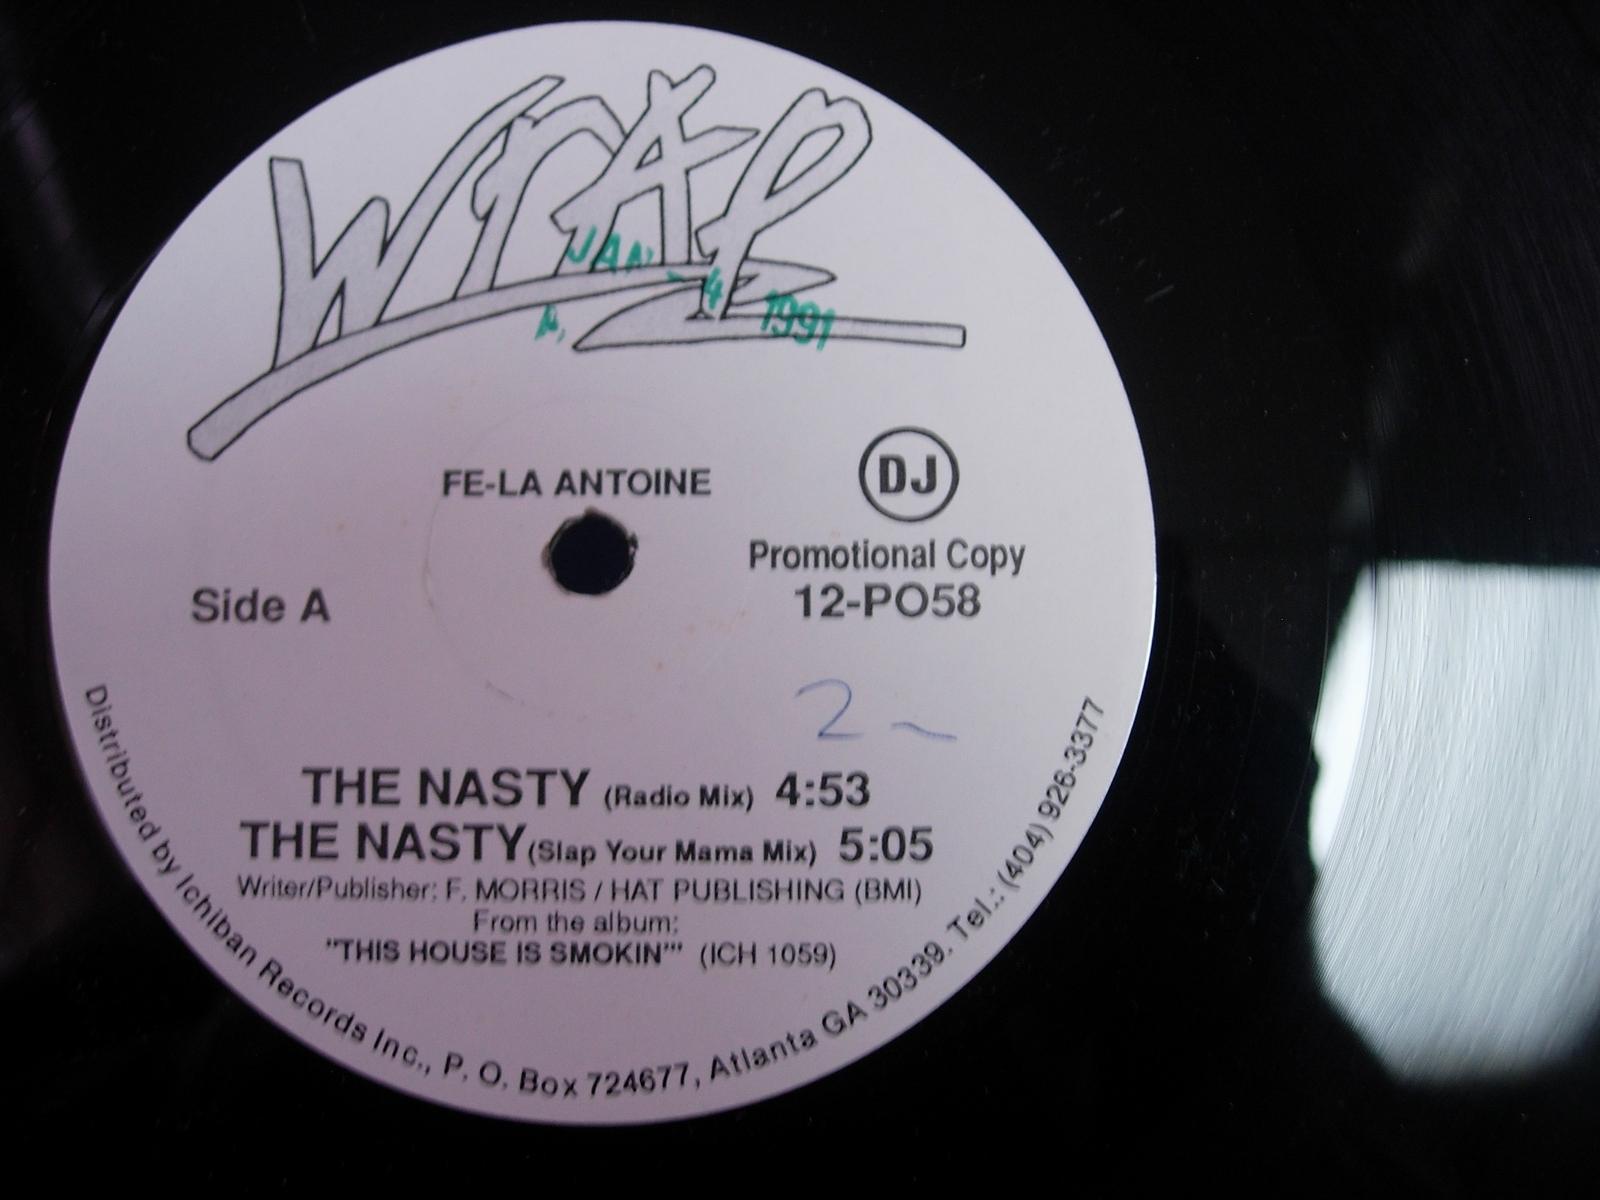 "Fe-La Antoine - The Nasty - Wrap Records 12-PO58 - 12"" Single PROMO"